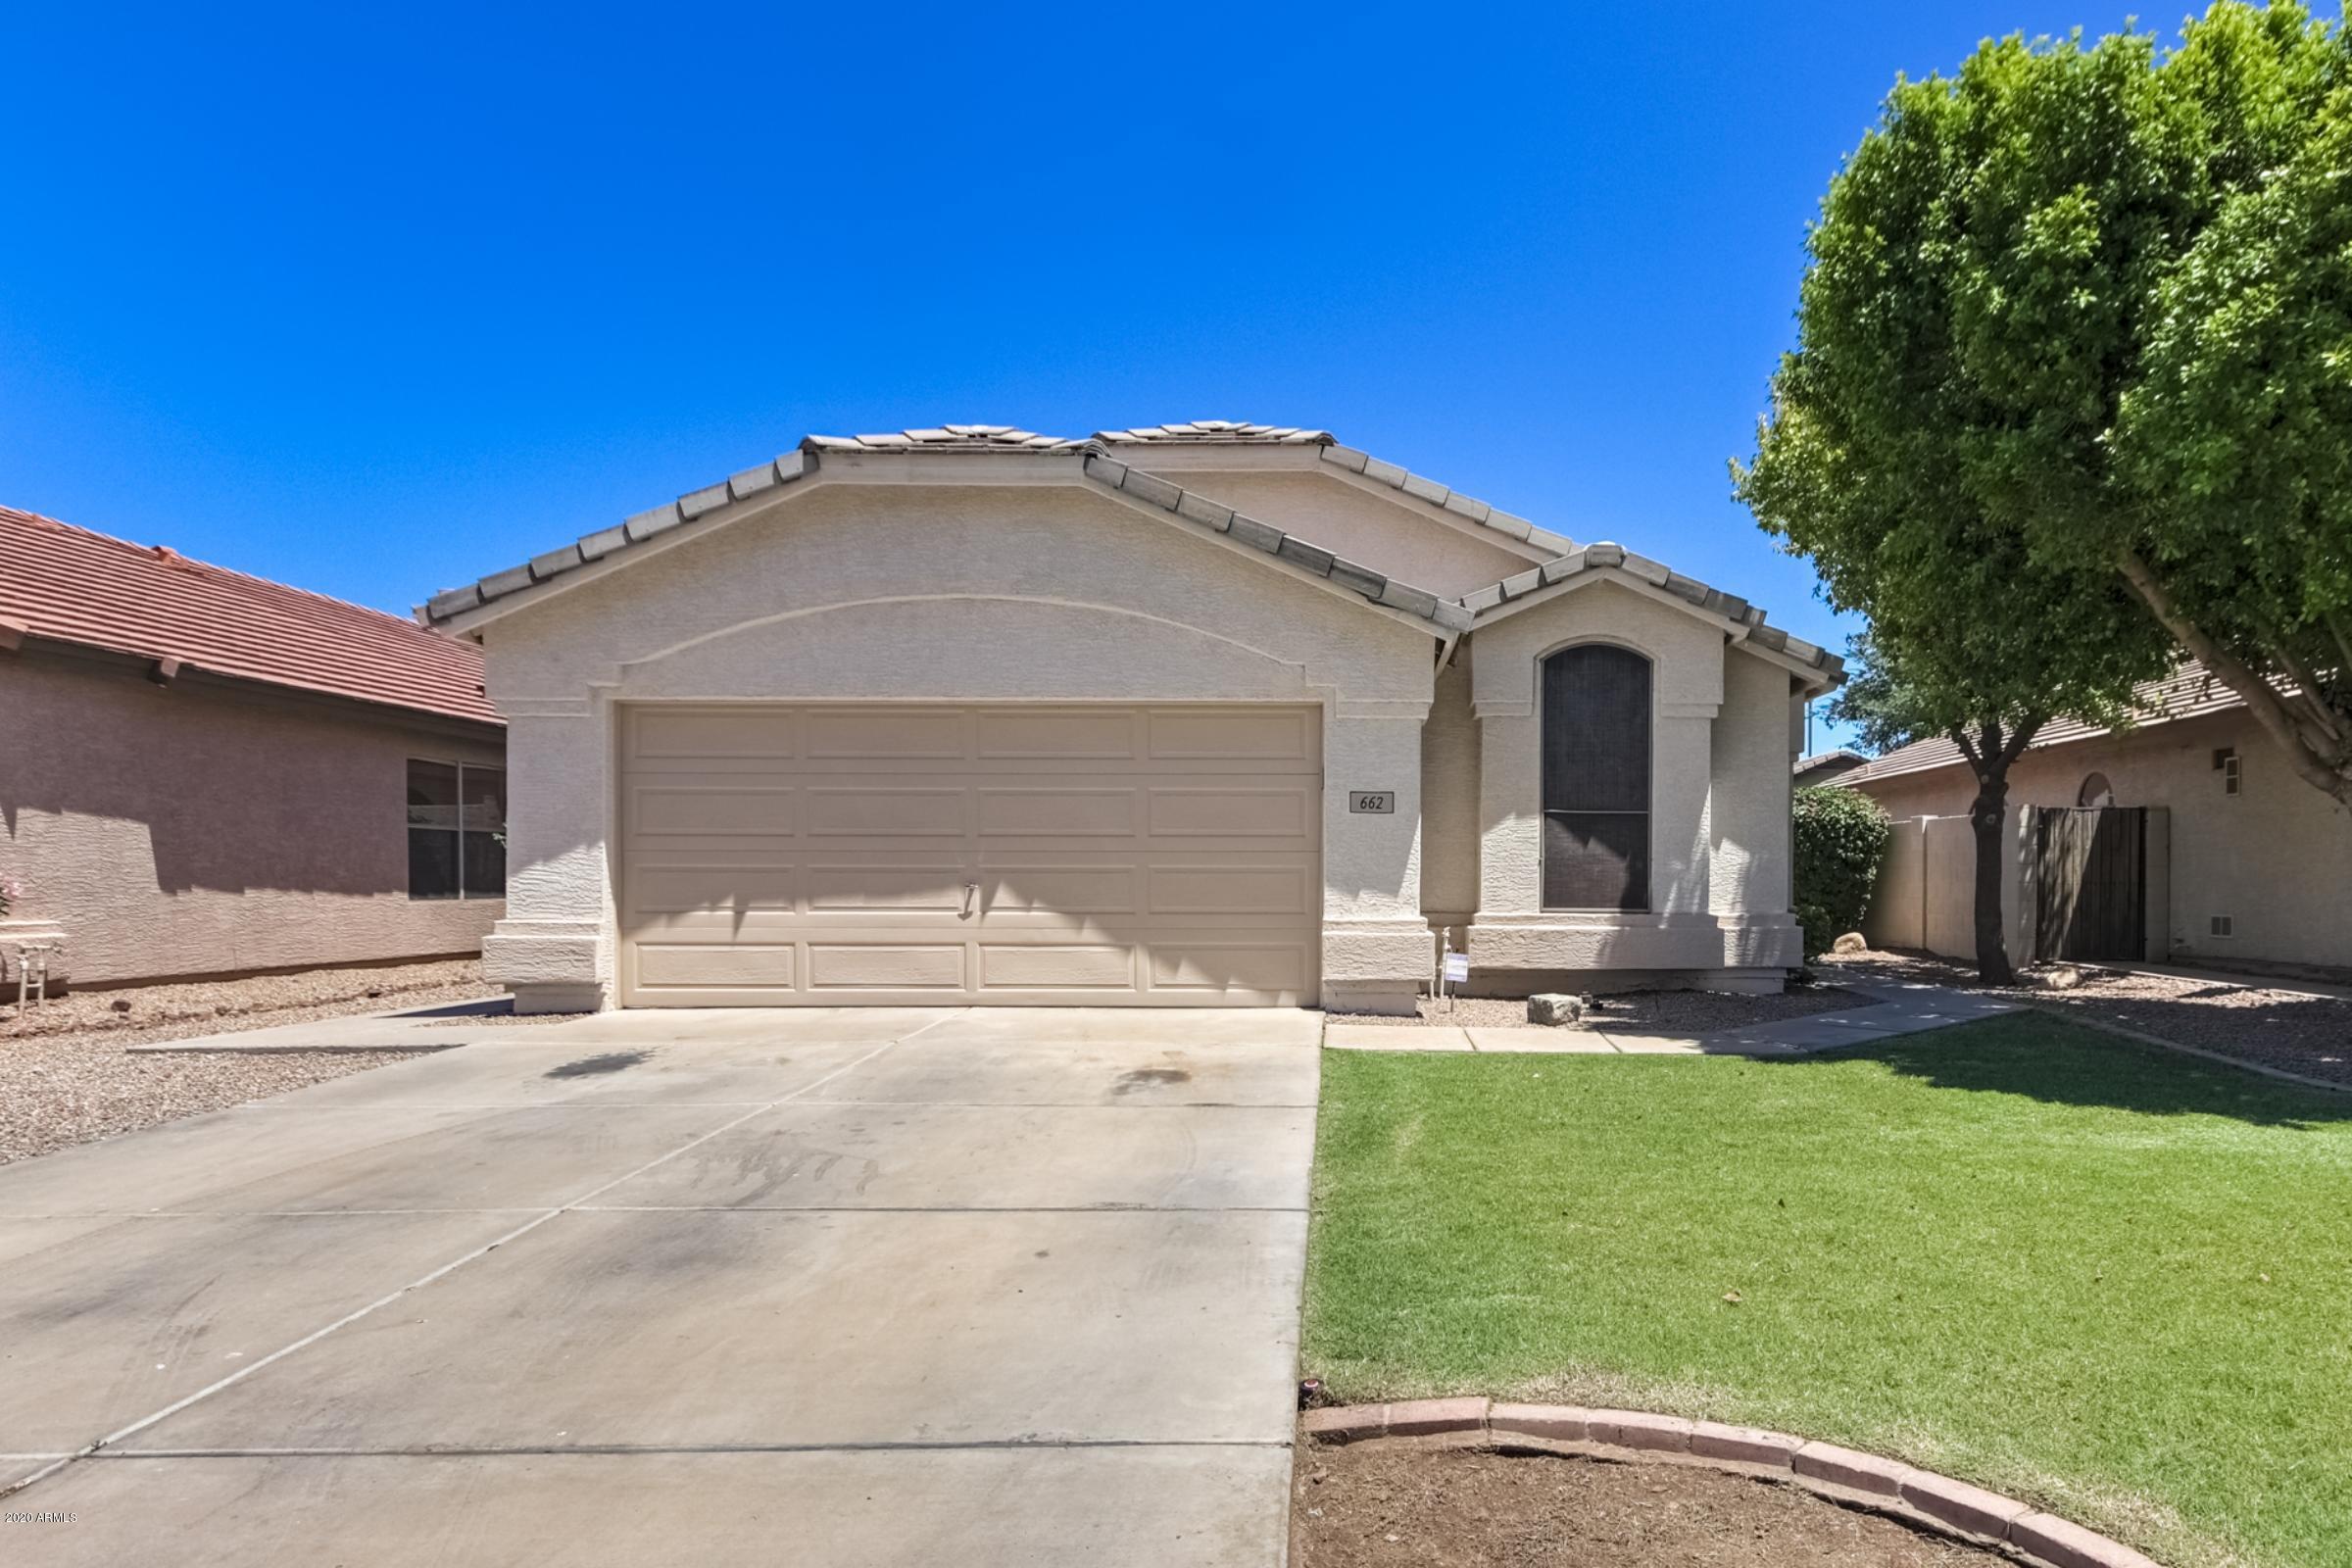 Photo of 662 E KYLE Drive, Gilbert, AZ 85296